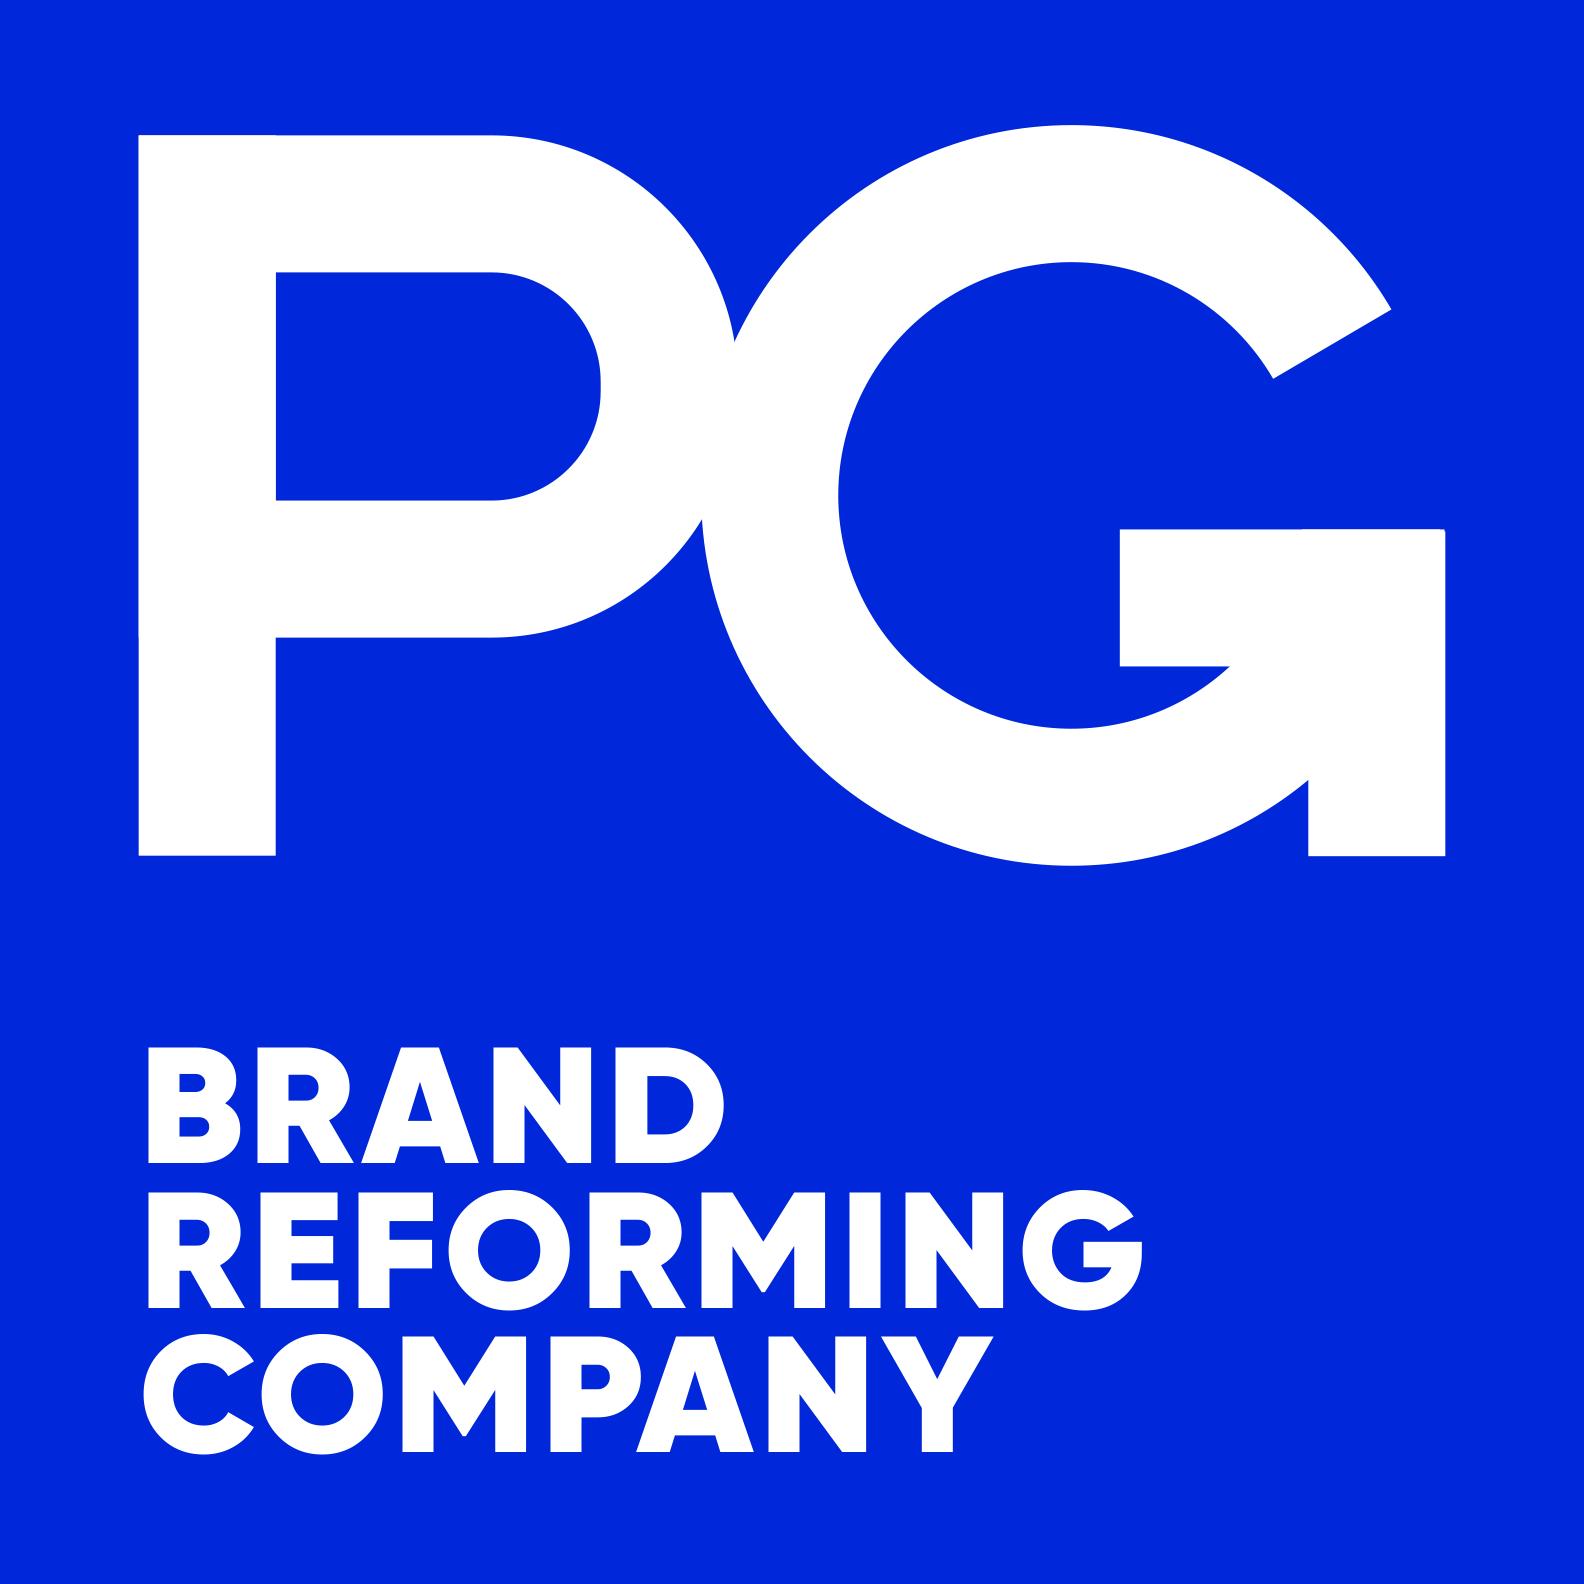 PG Brand Reforming Company Logo